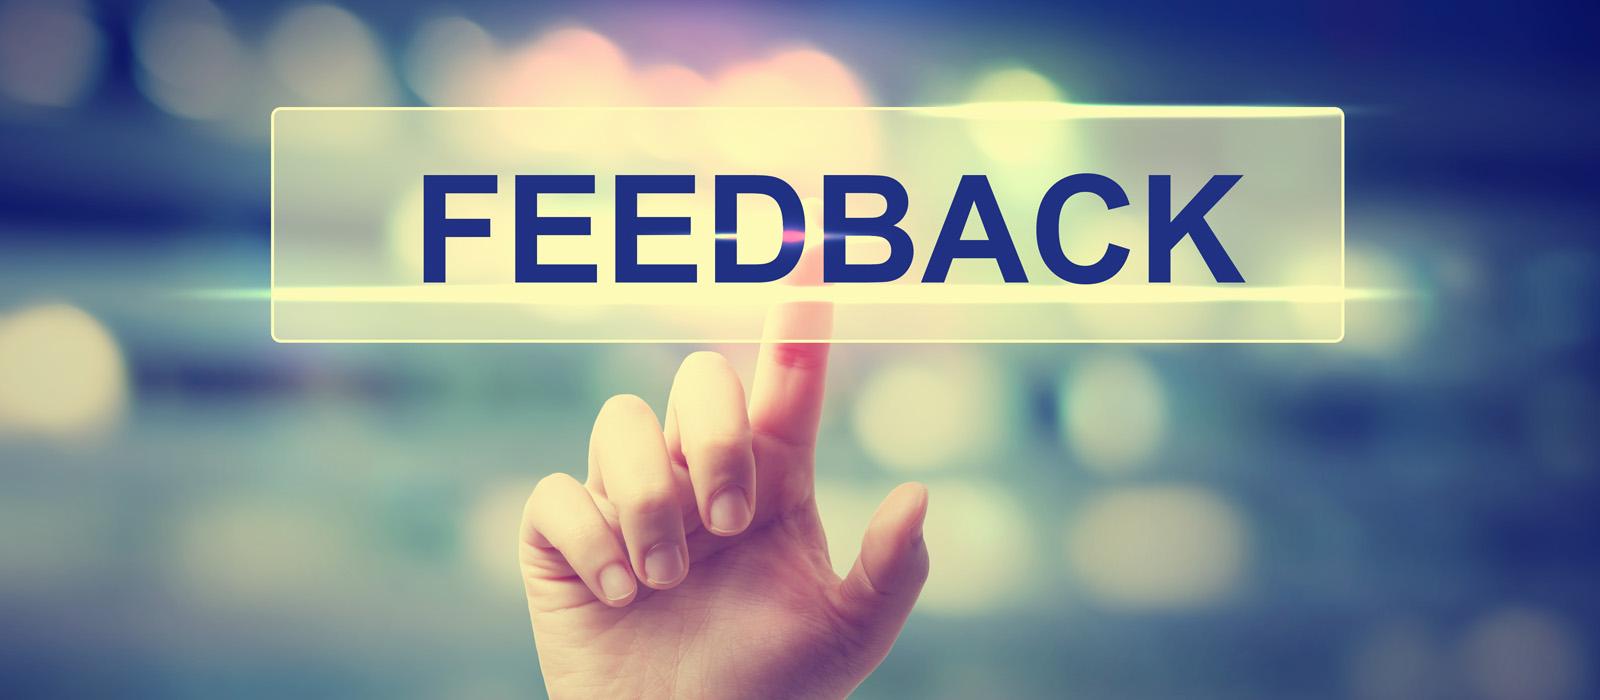 Waarom-feedback-niet-leidt-tot-verandering